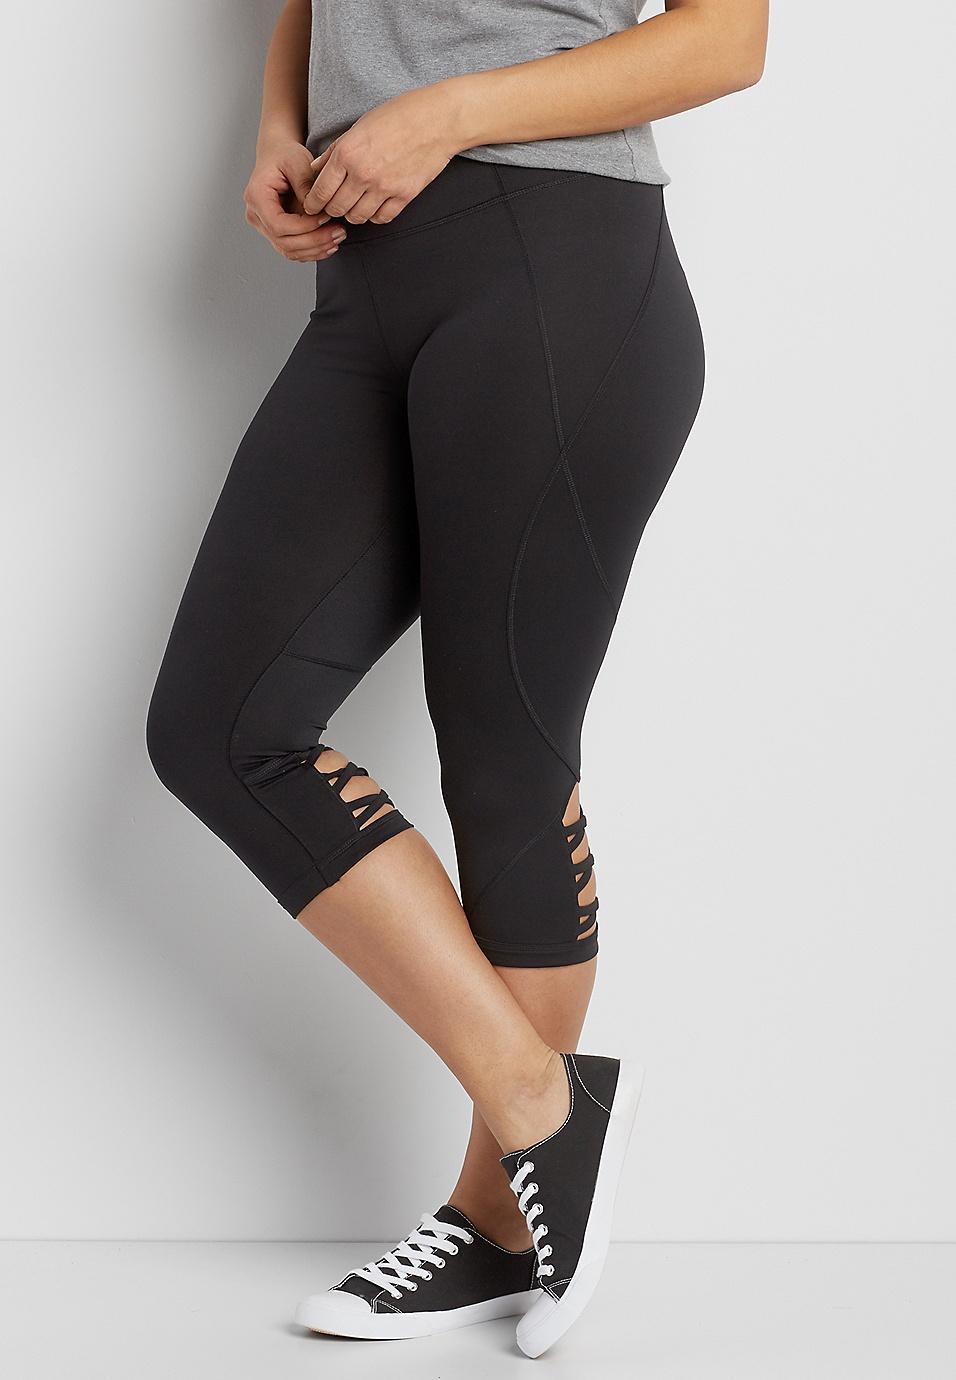 d11e88e09996ec plus size capri legging with strappy back bottom hem | maurices